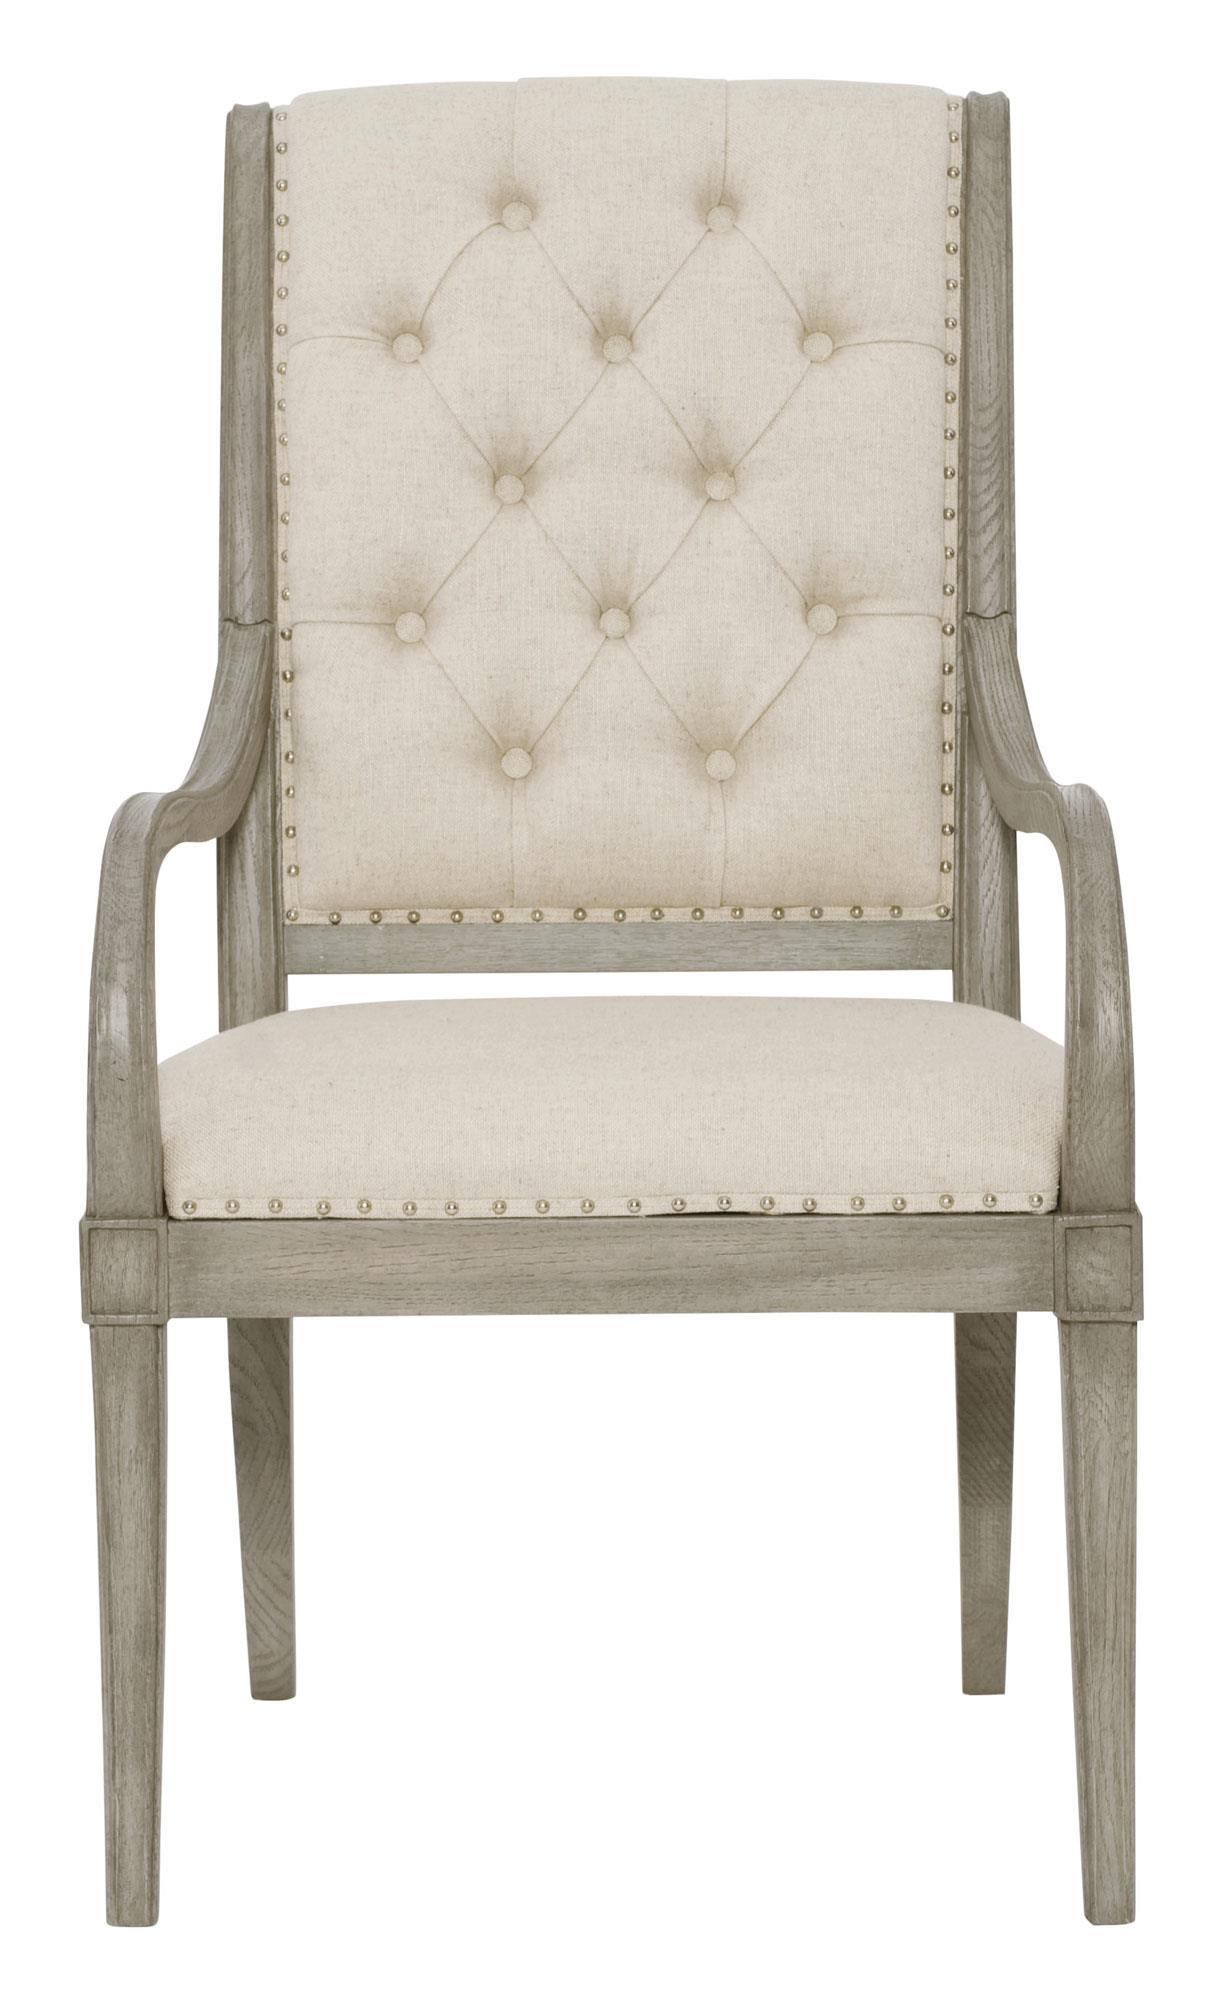 Bernhardt Marquesa Arm Chair - Item Number: 359-542